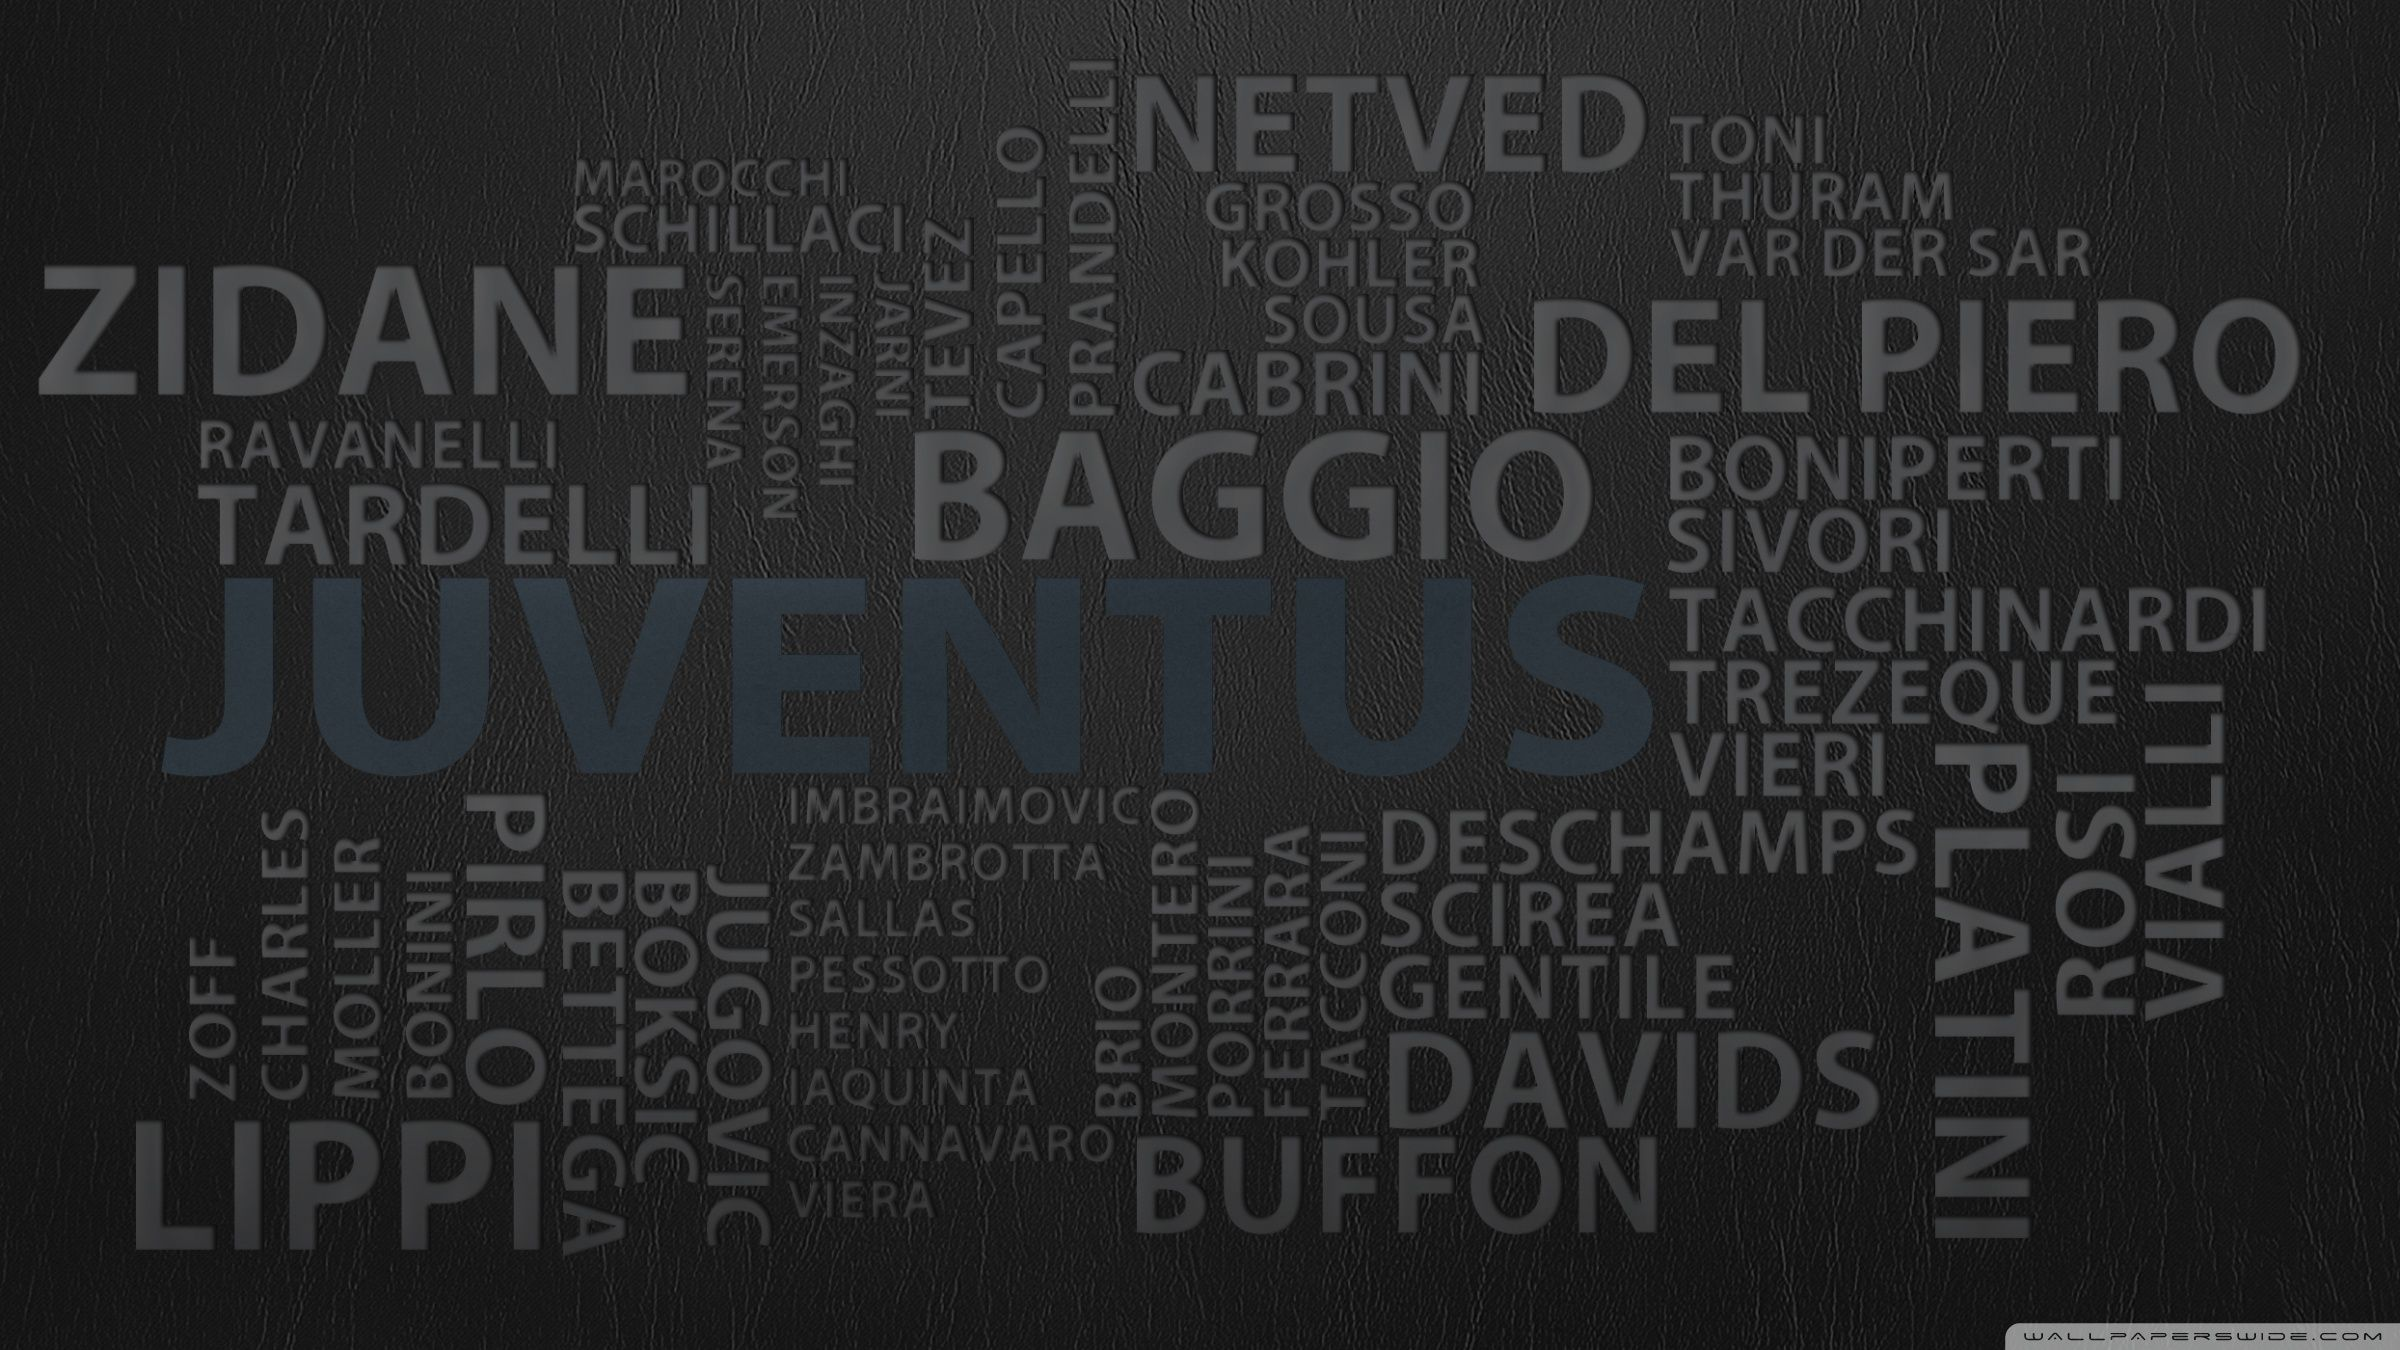 Juventus Official Wallpaper High resolution wallpapers